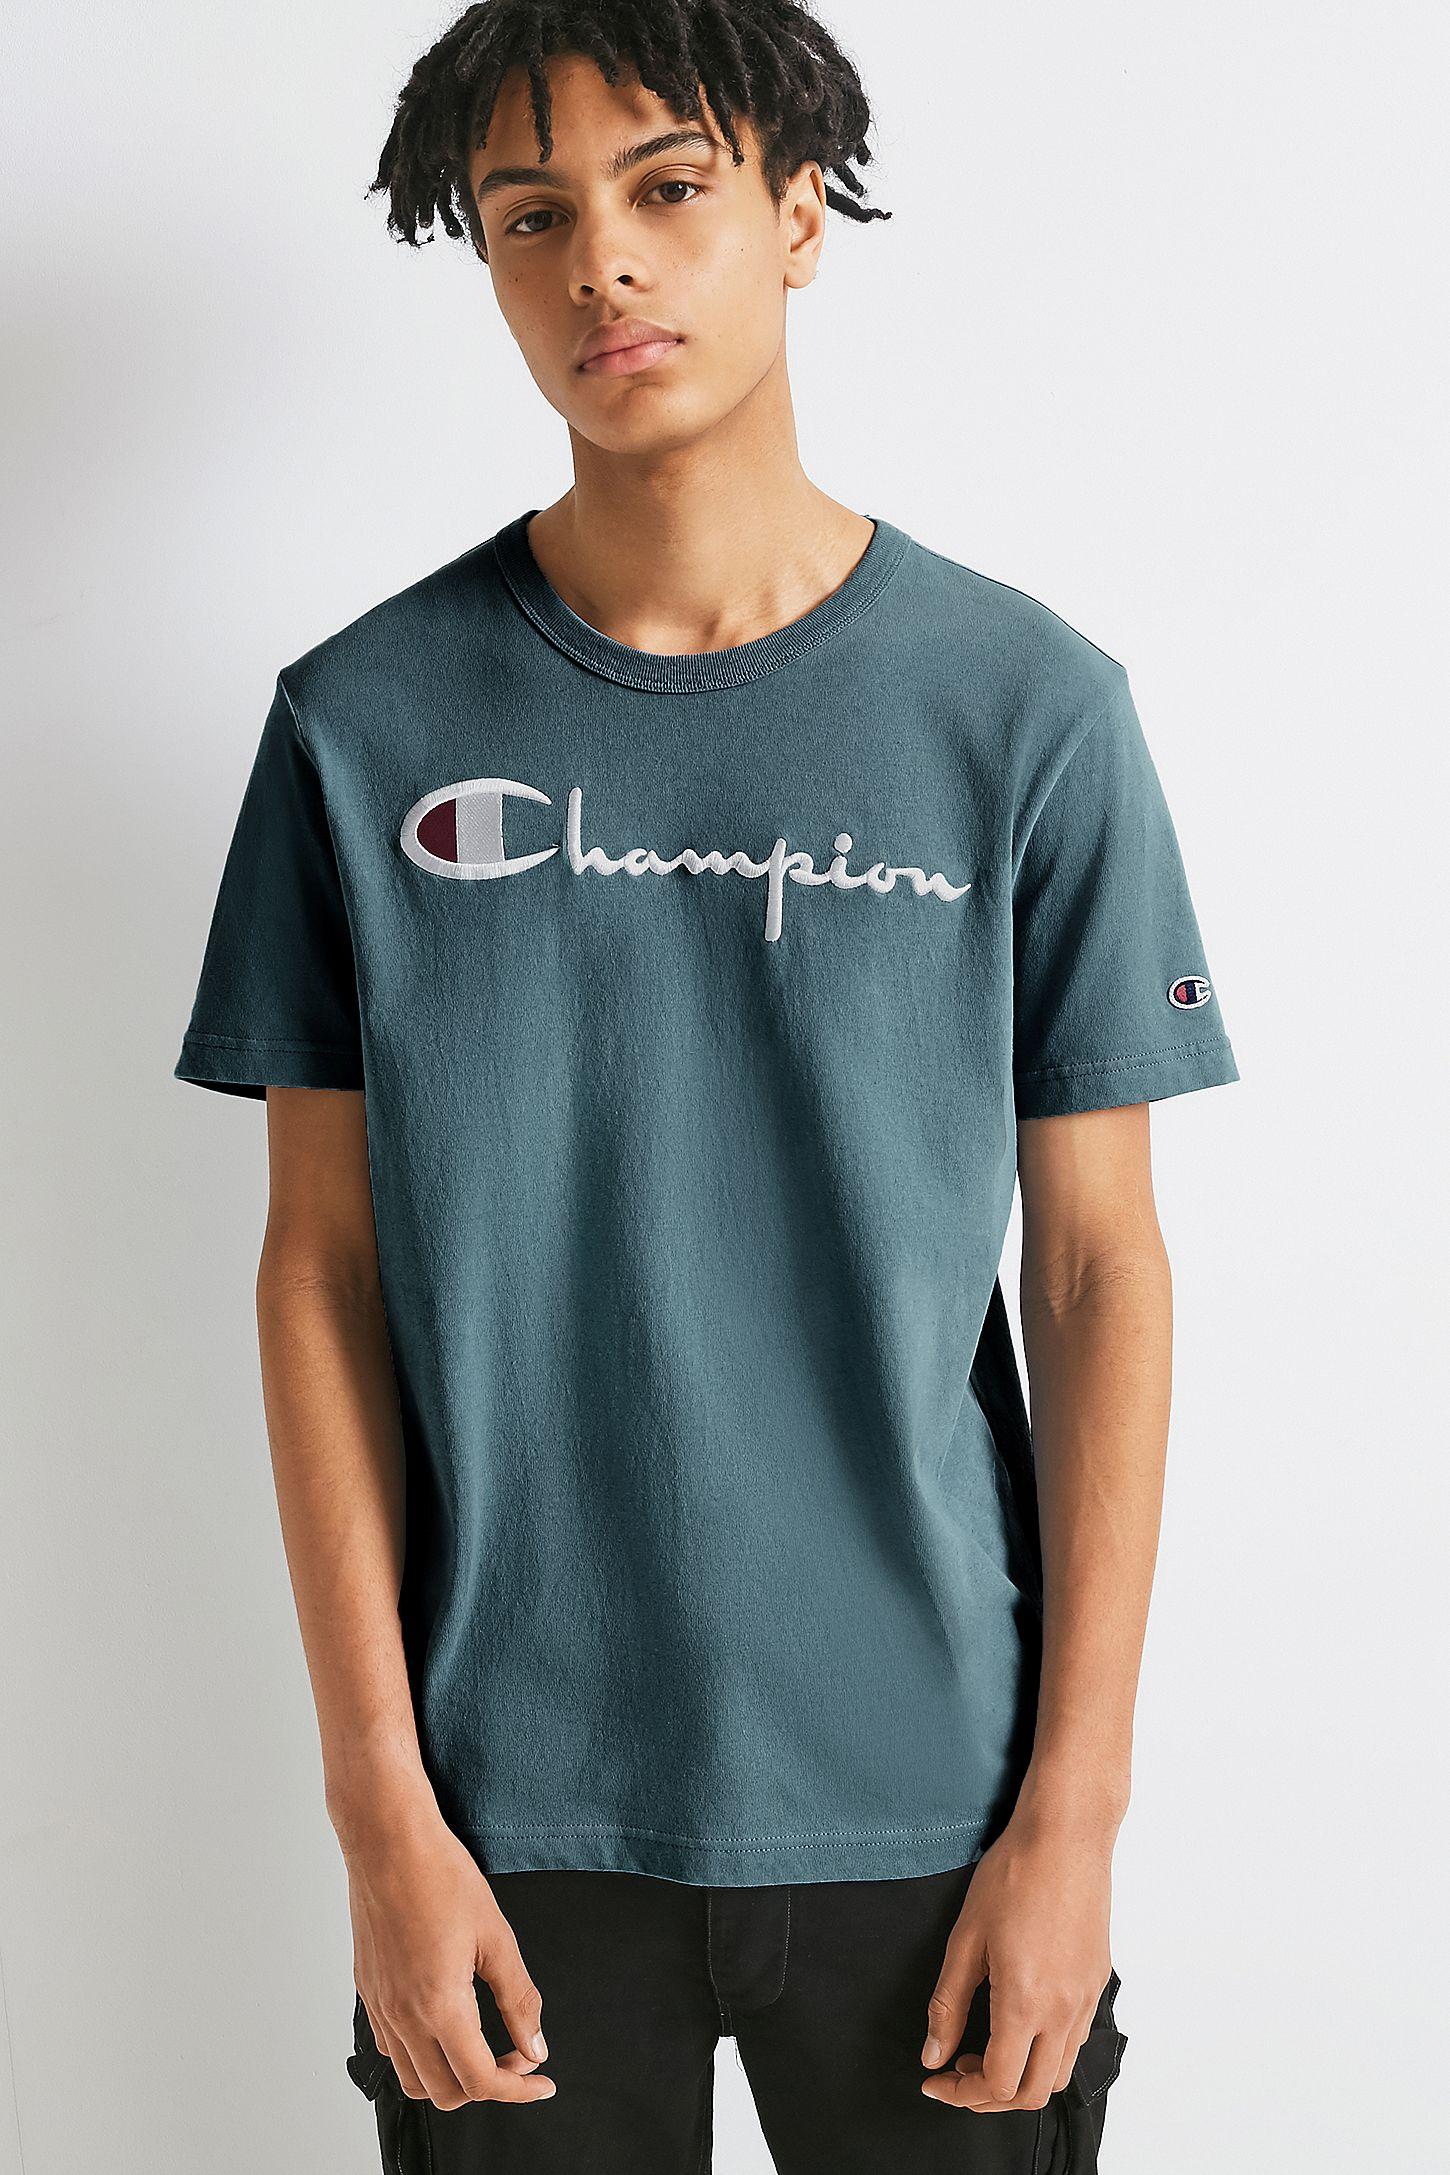 8d175fd7 Champion Script Teal Reverse Weave T-shirt | Urban Outfitters UK